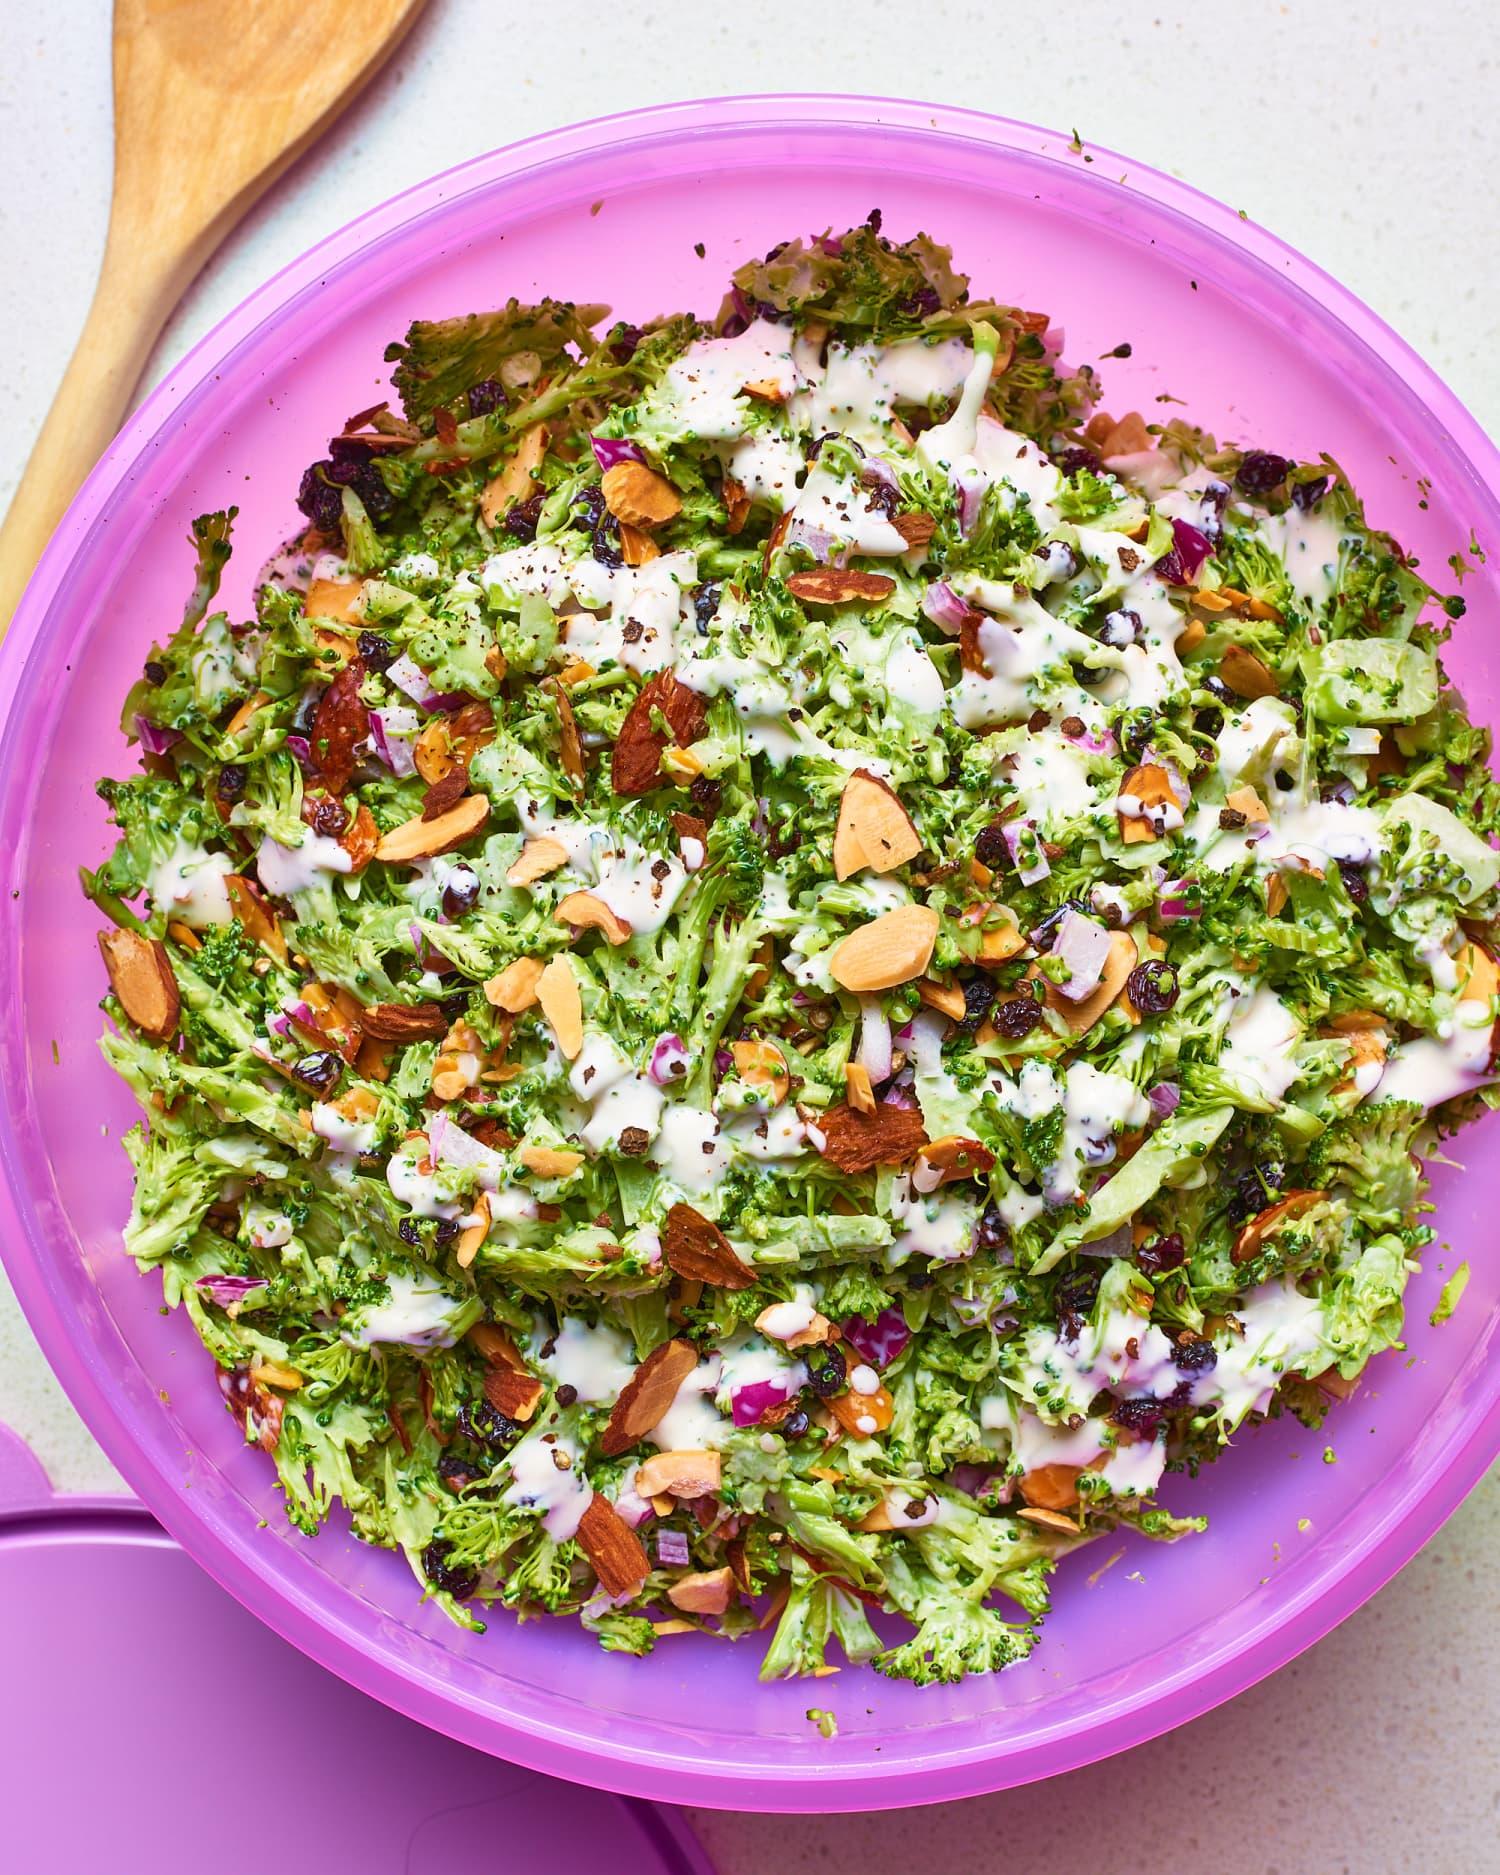 Recipe: Light & Easy Broccoli Salad